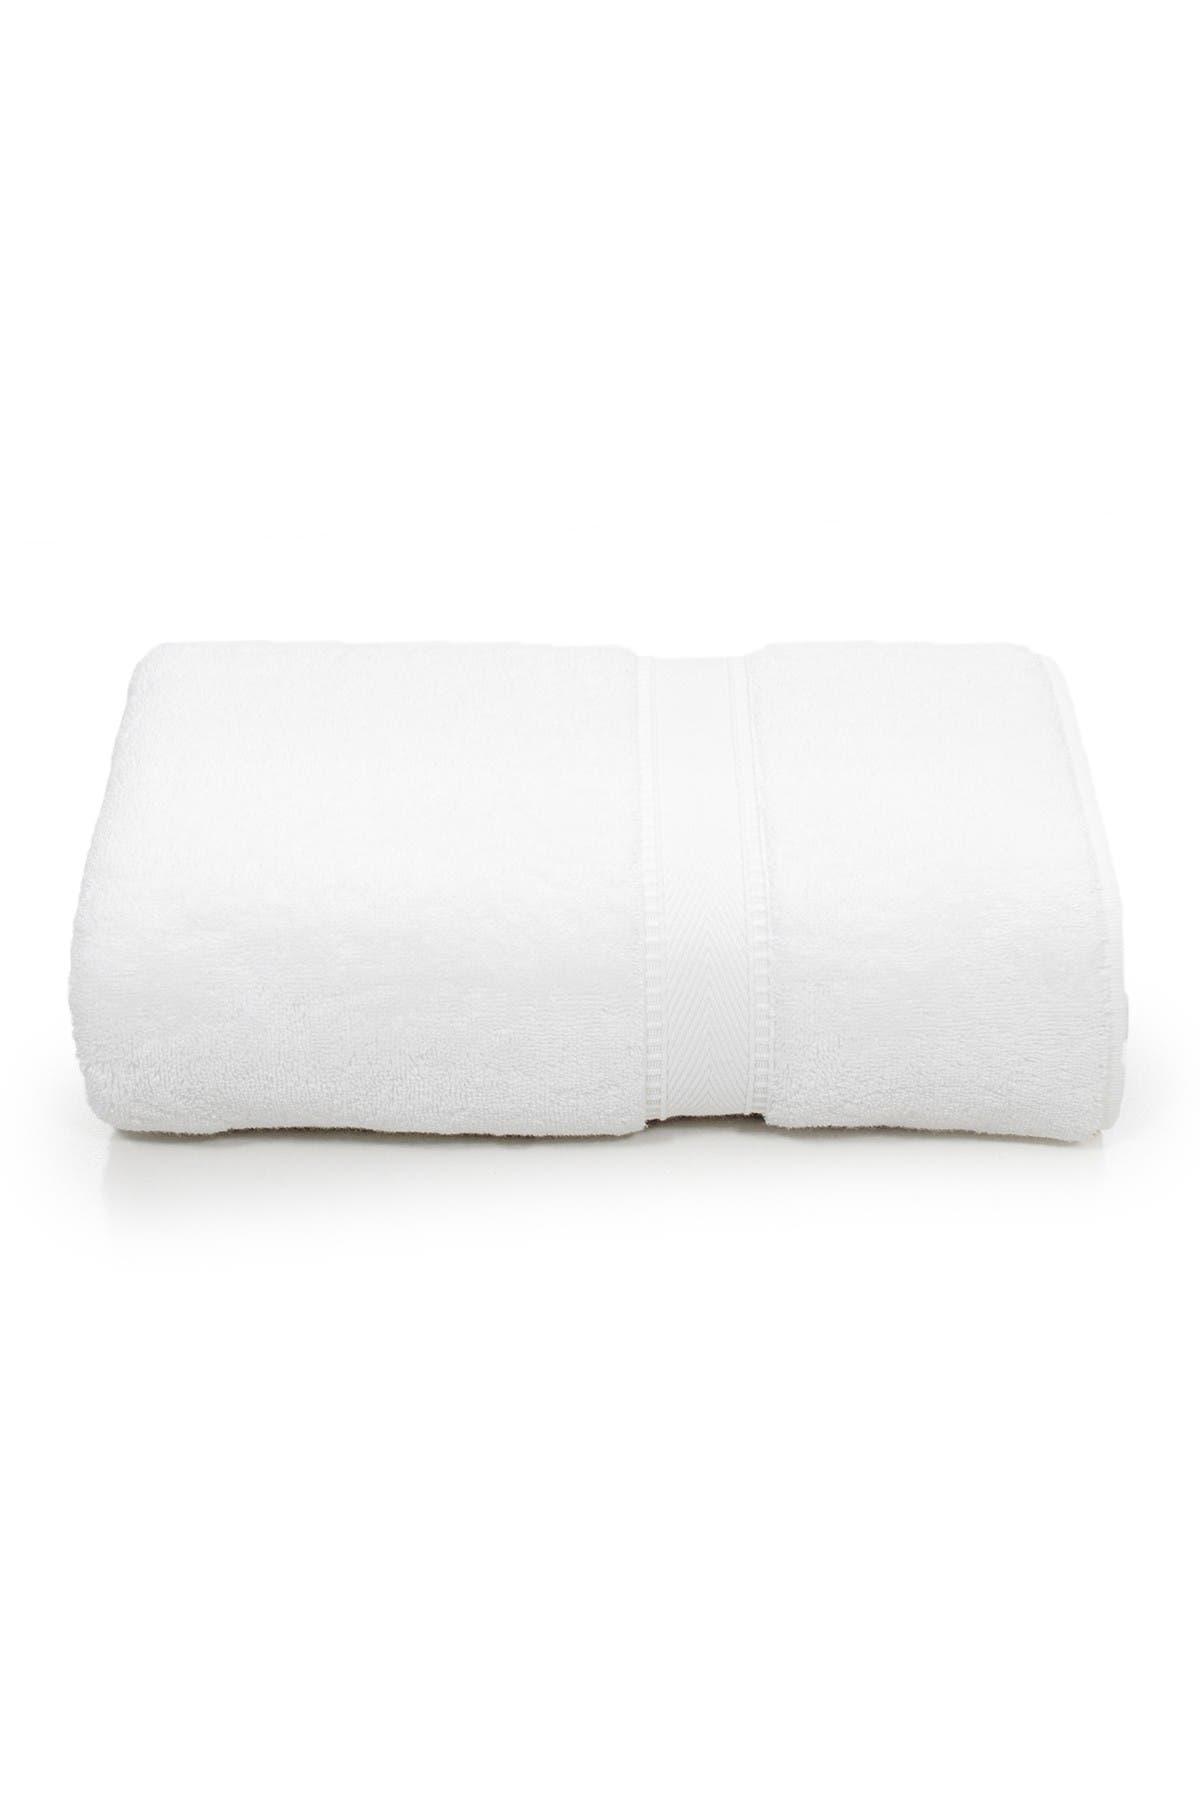 Image of LINUM HOME Sinemis Terry Bath Towel - White